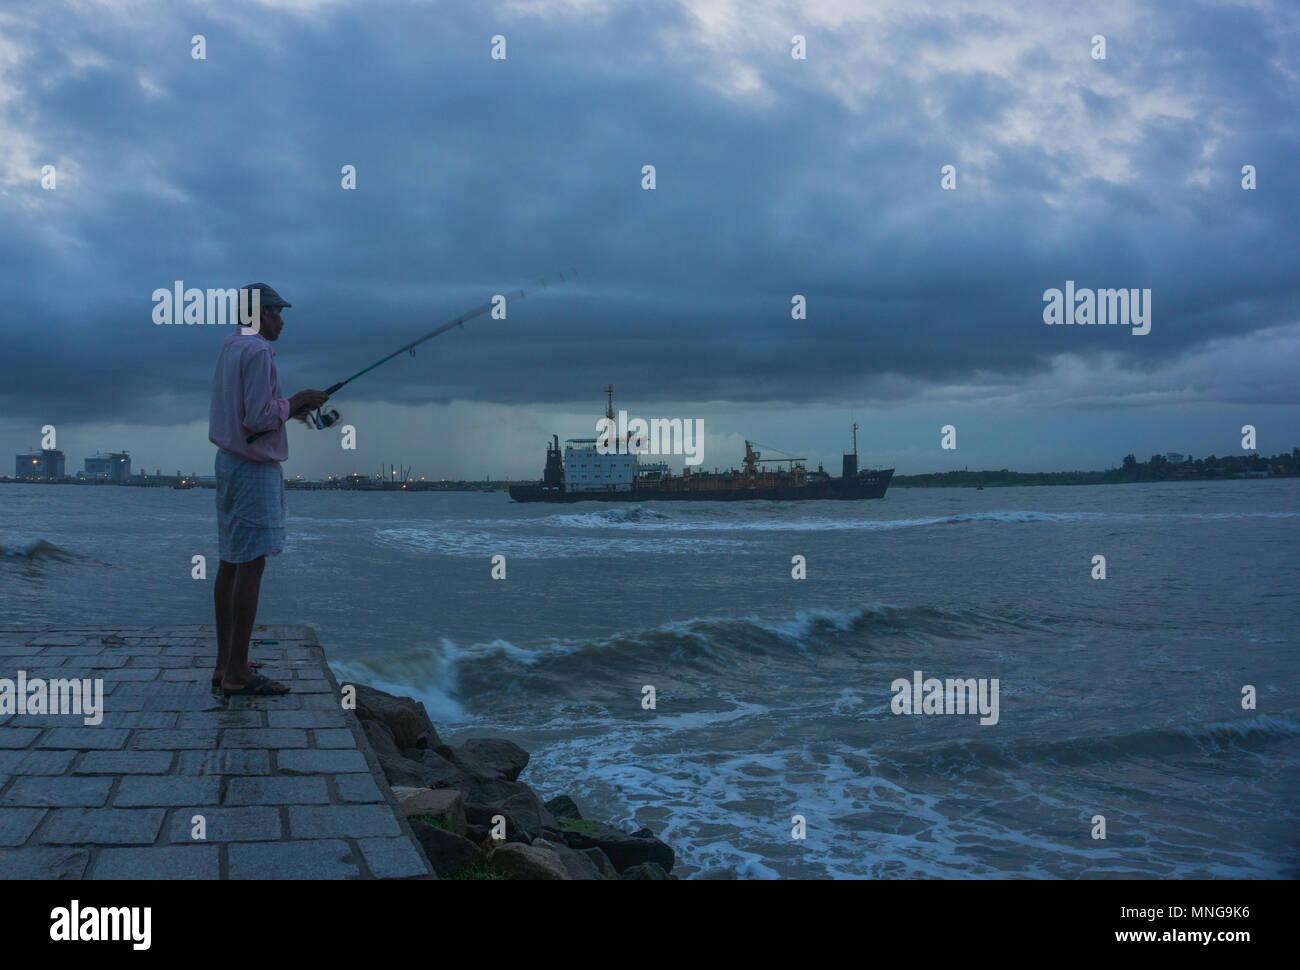 A man angling at Fort Kochi beachfront - Stock Image